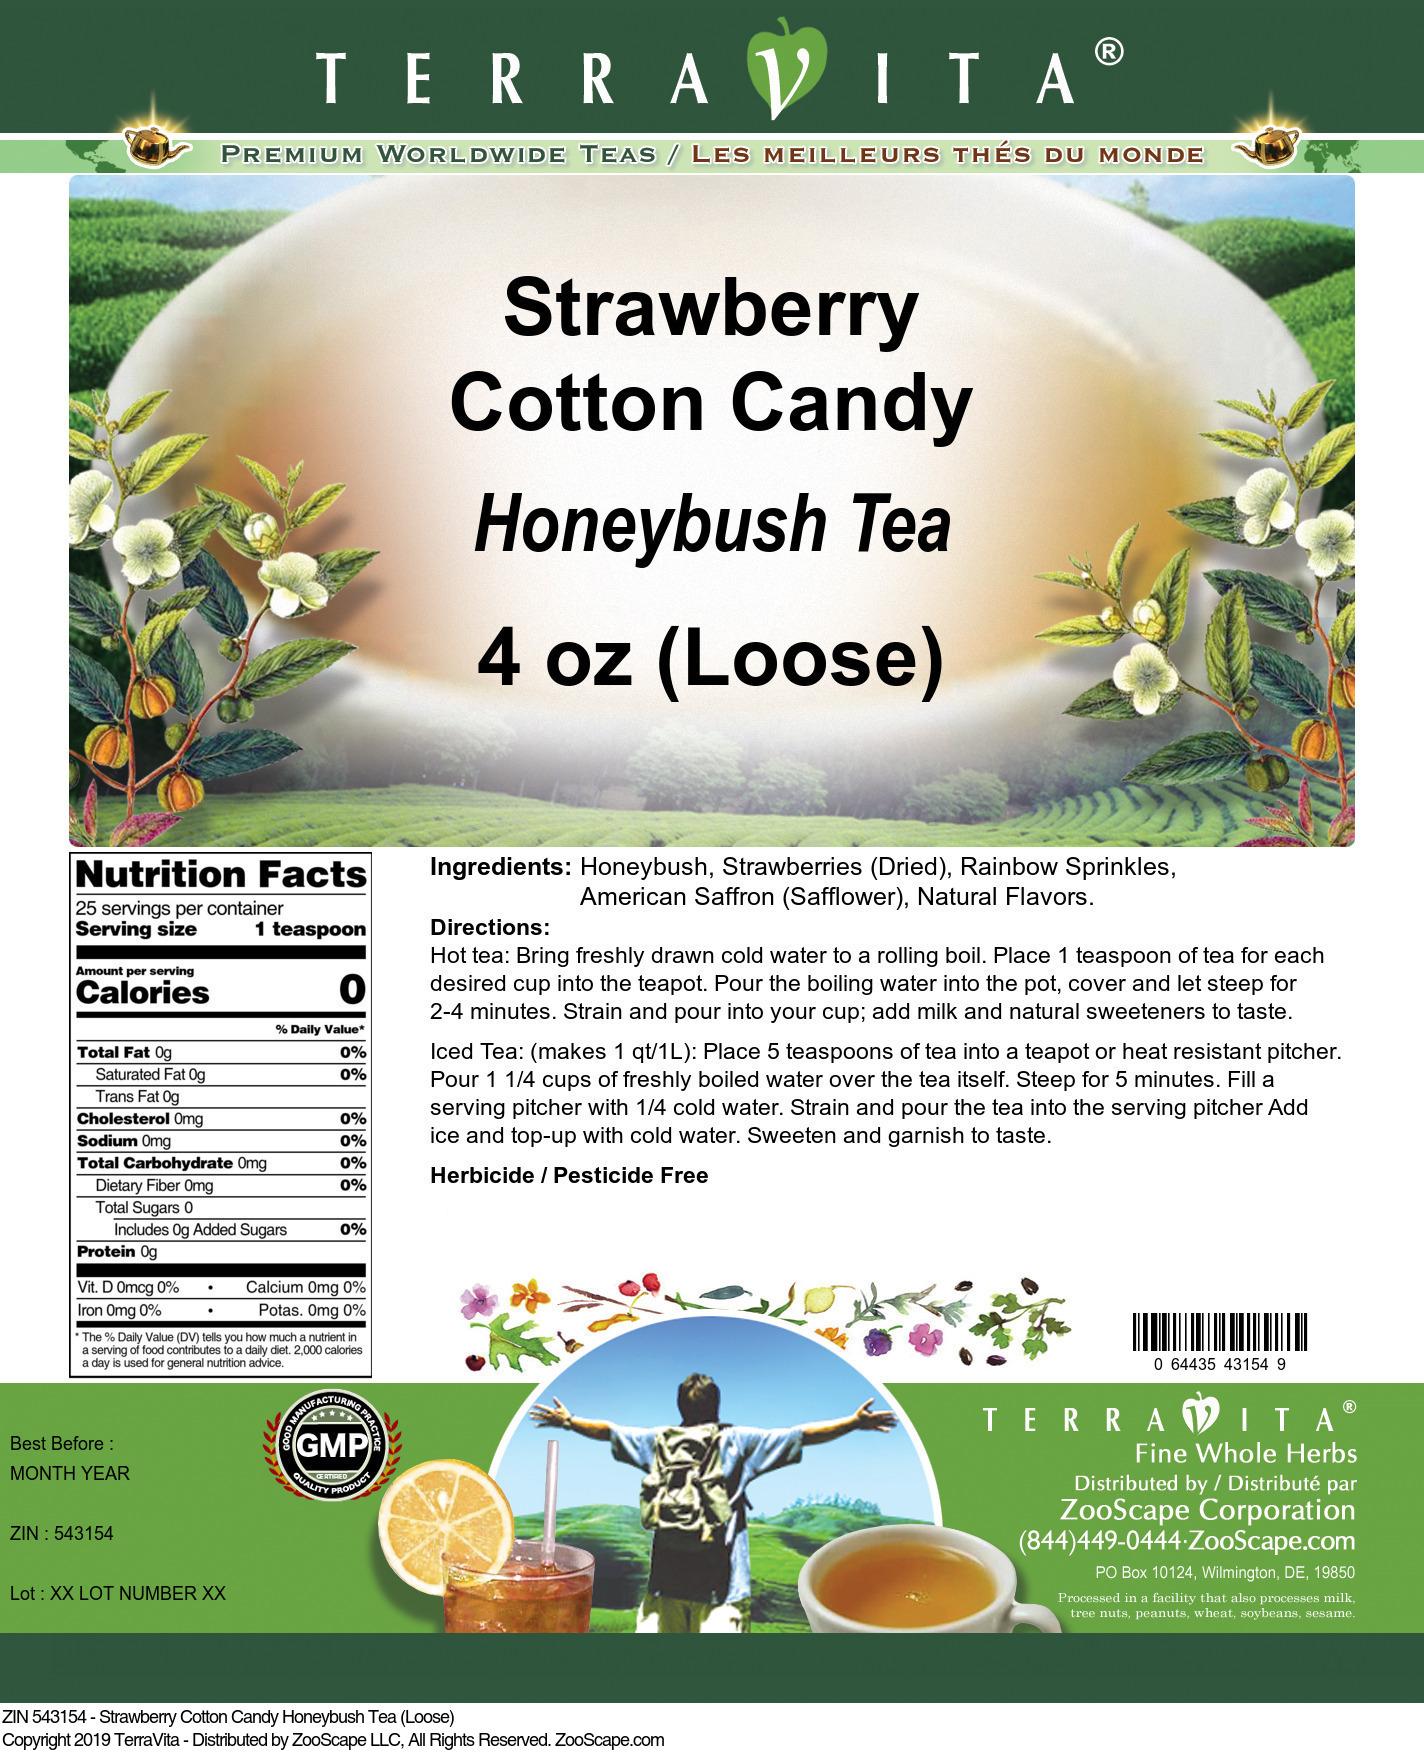 Strawberry Cotton Candy Honeybush Tea (Loose)